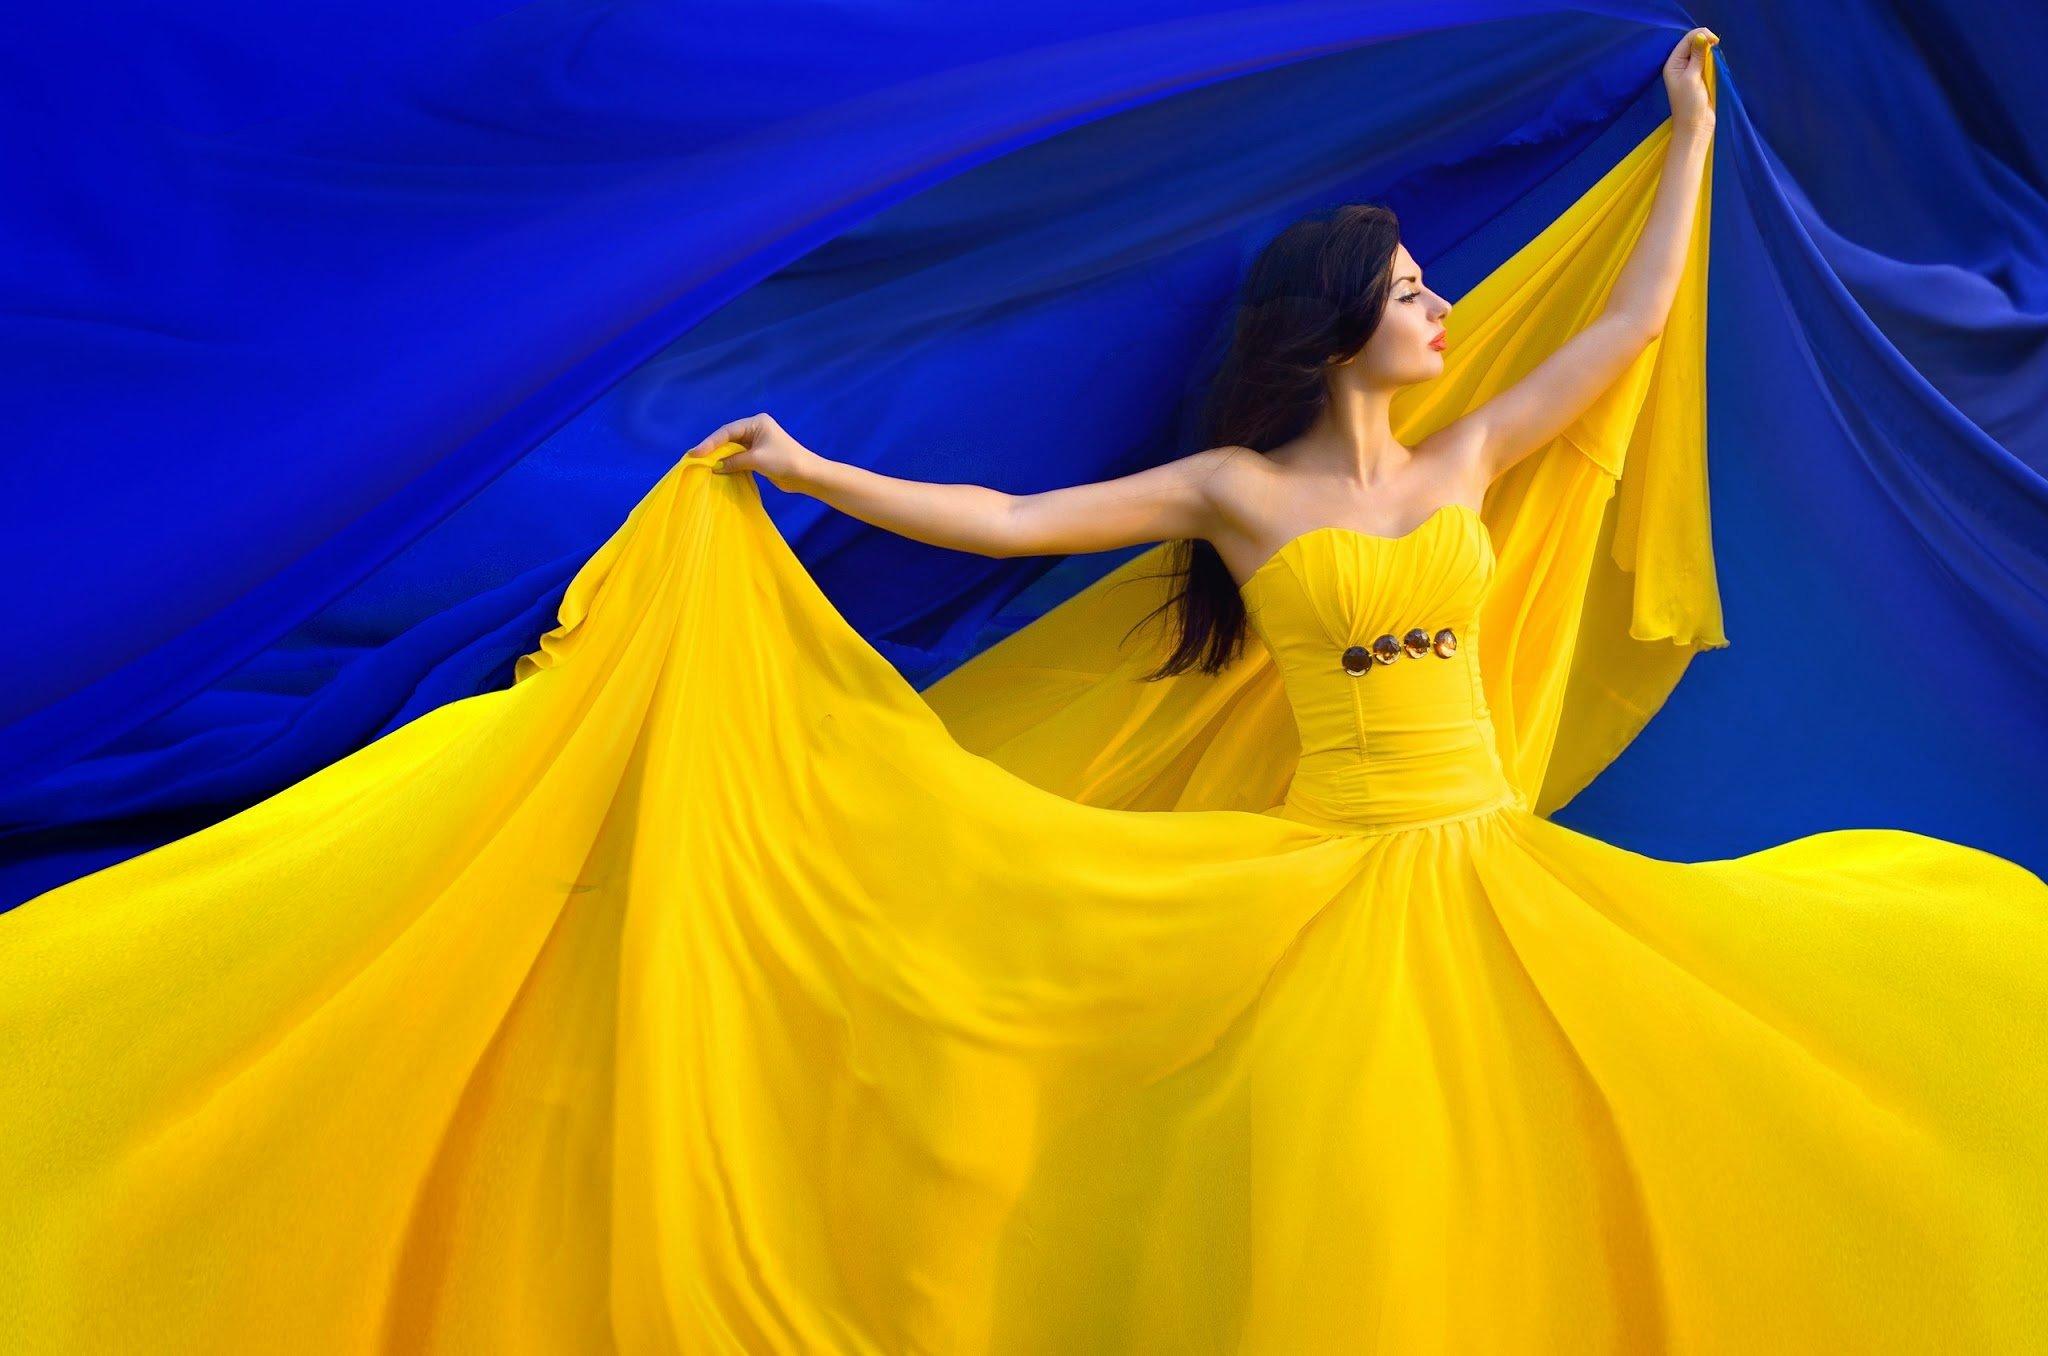 Целка україке відео 20 фотография